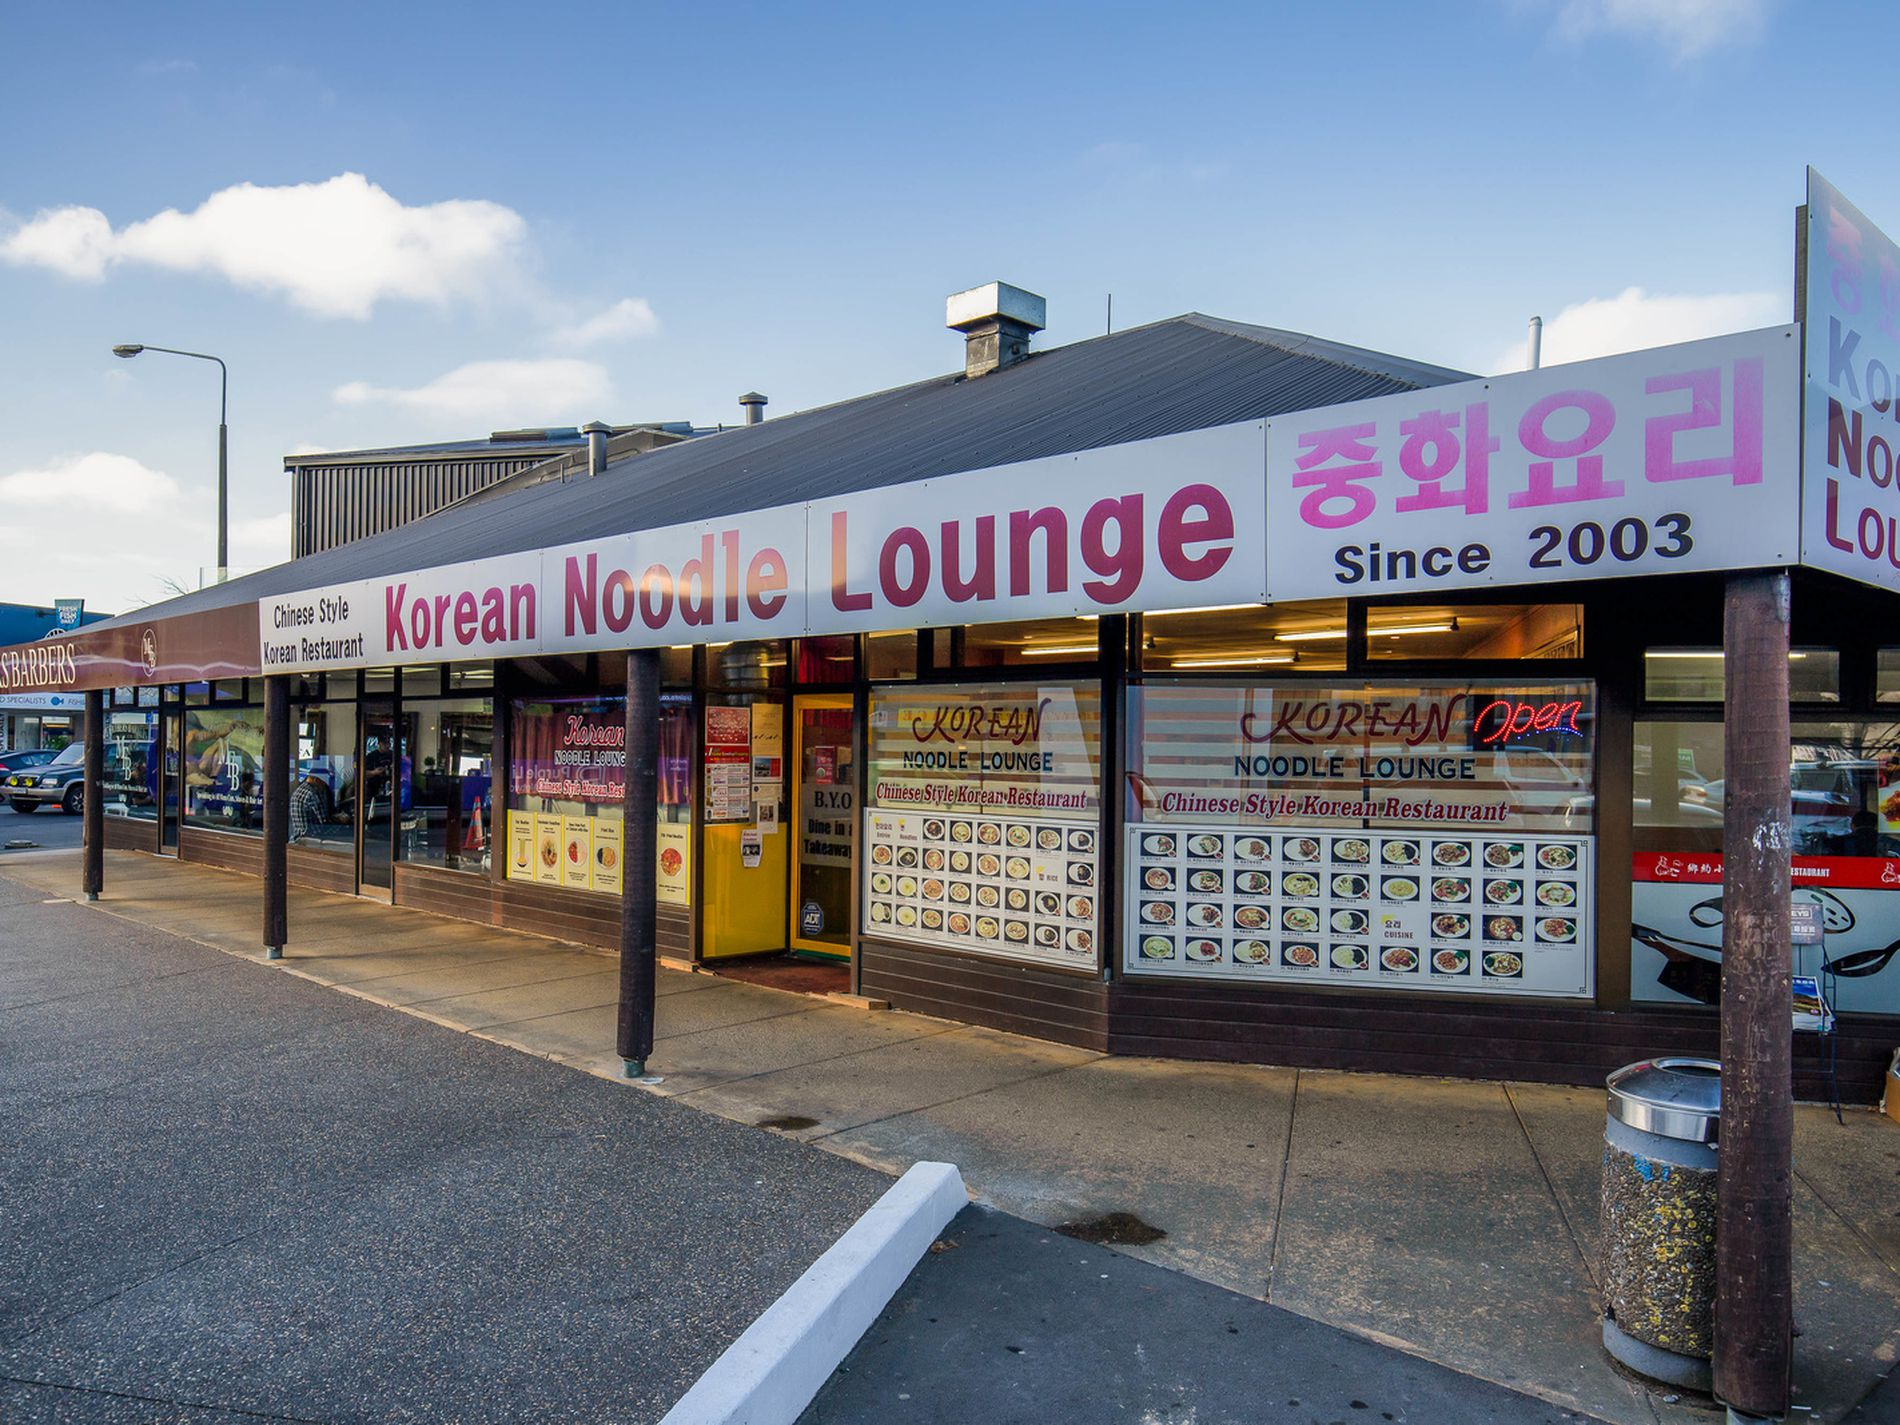 Korean Noodle Lounge